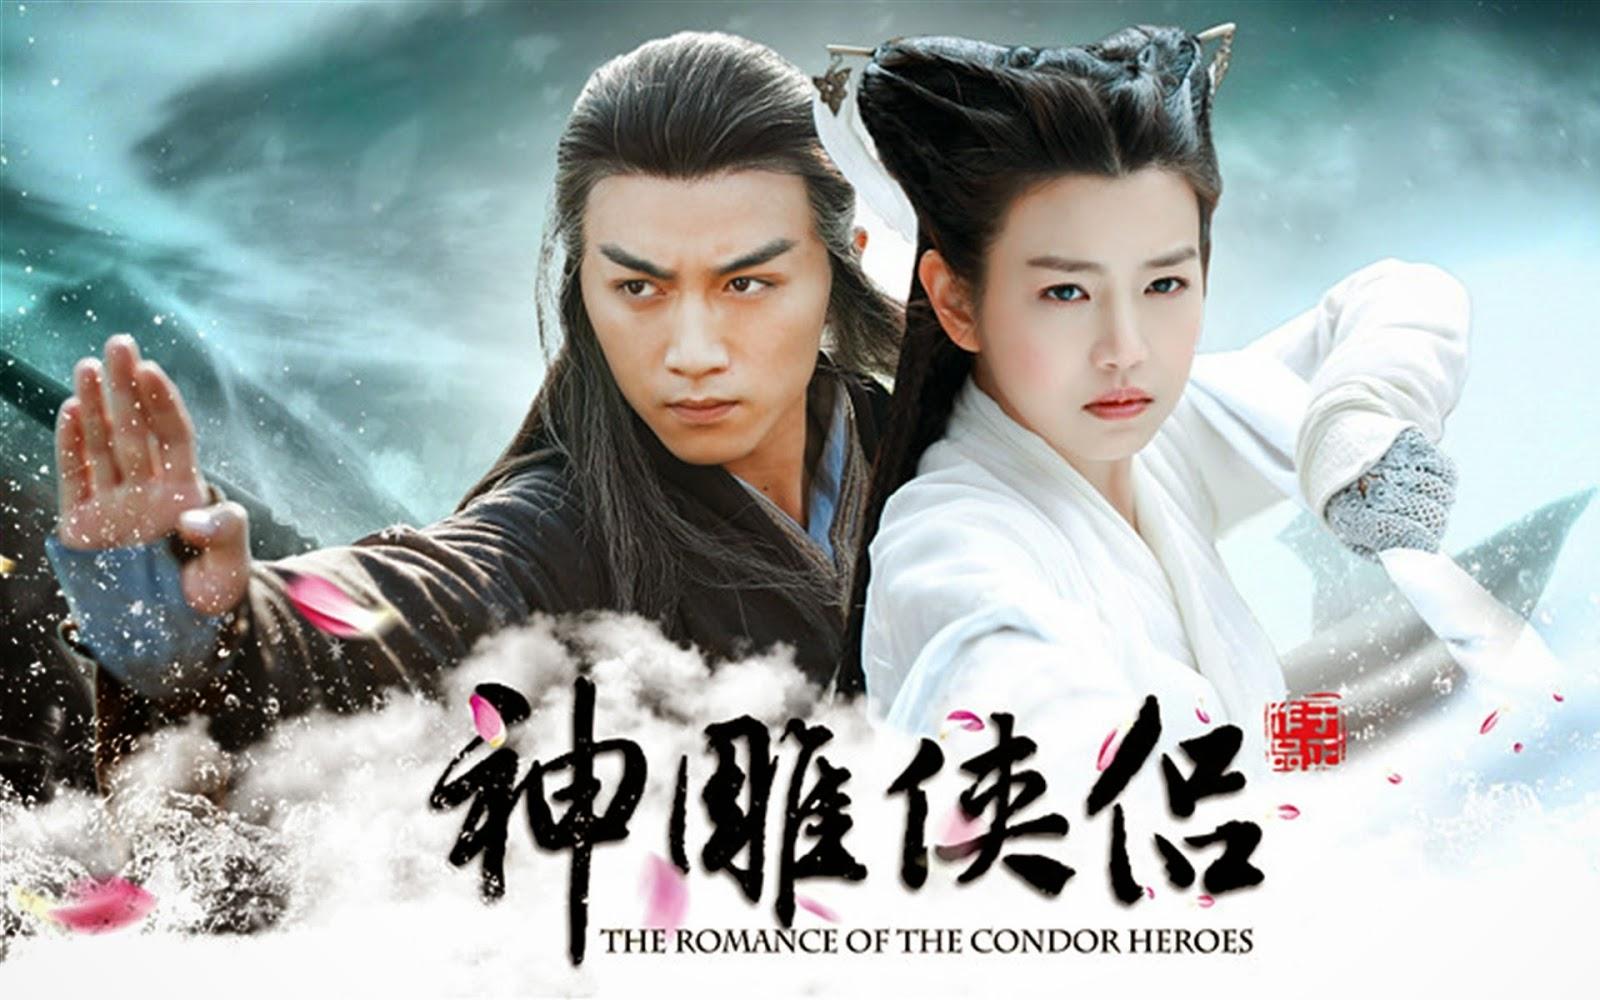 http://sinopsistentangfilm.blogspot.com/2015/04/sinopsis-romance-of-condor-heroes-rcti.html